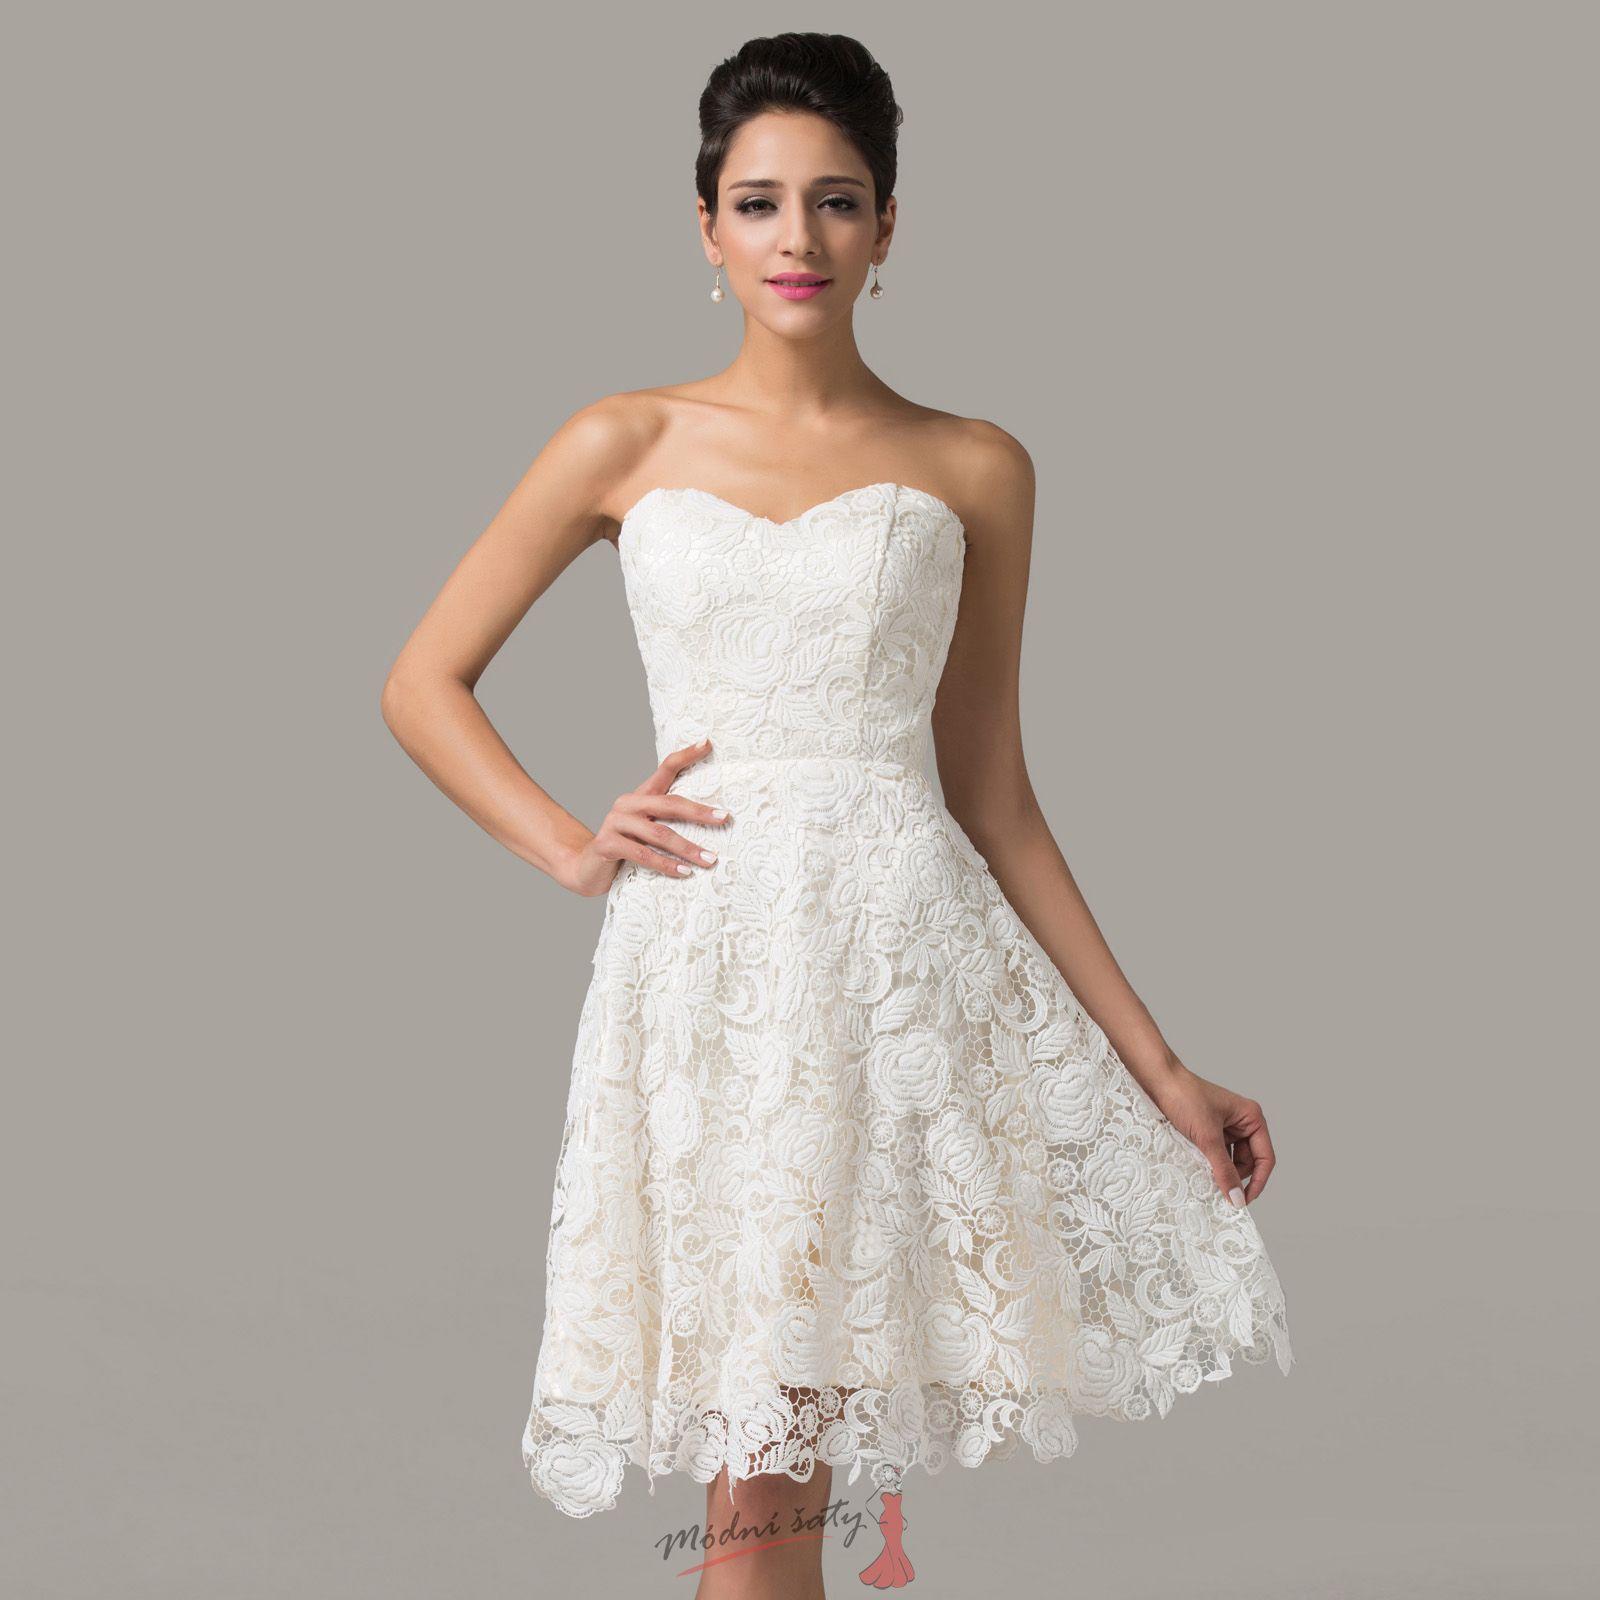 dffdd3d3e8e8 Krátké krajkové šaty